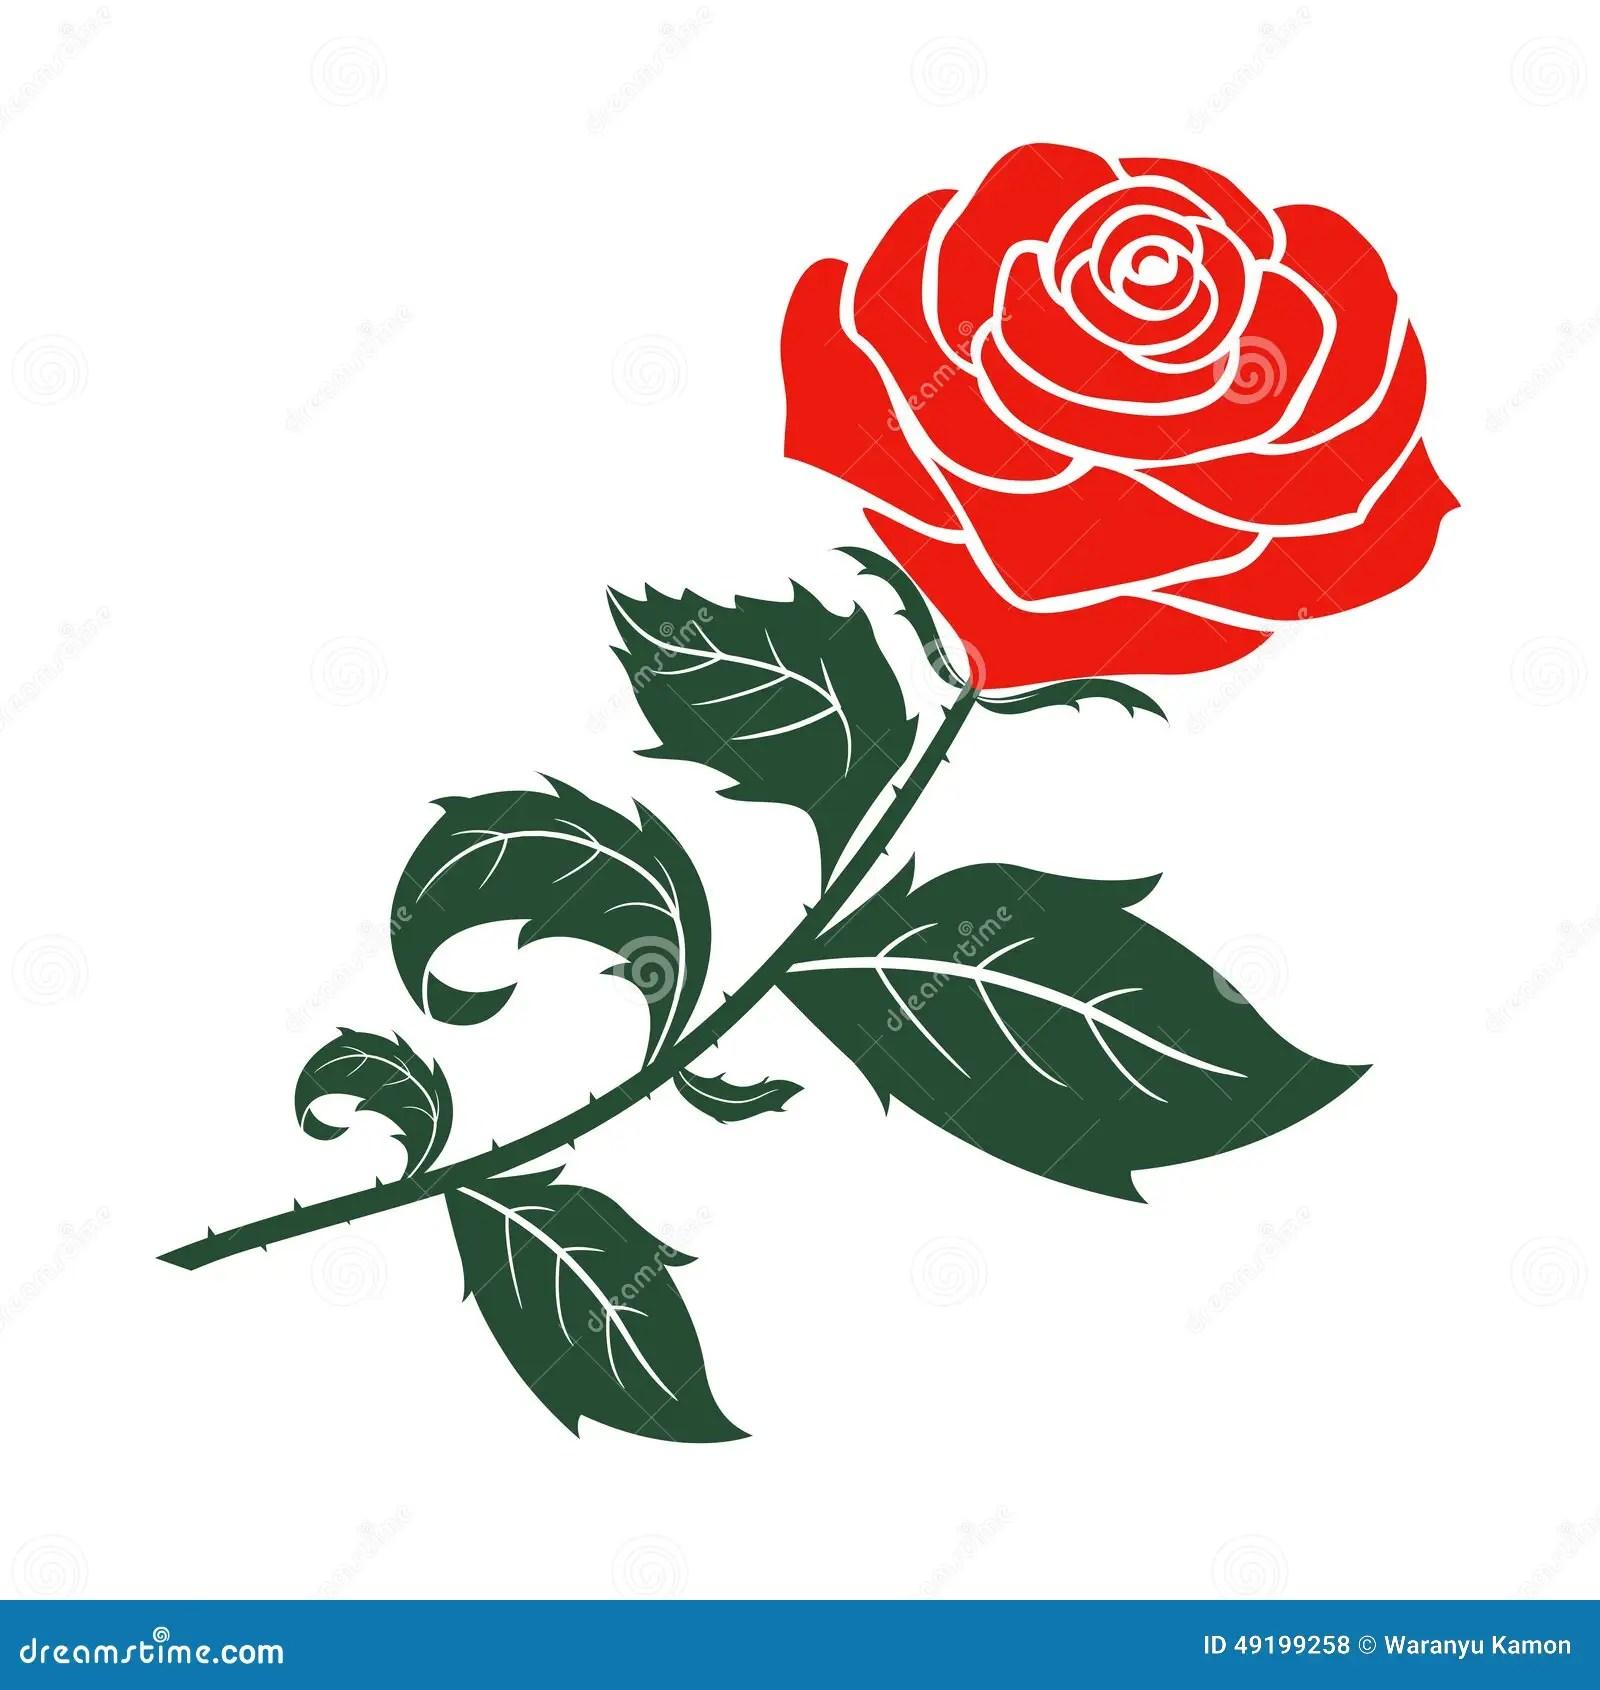 Red rose vector design stock vector. Illustration of